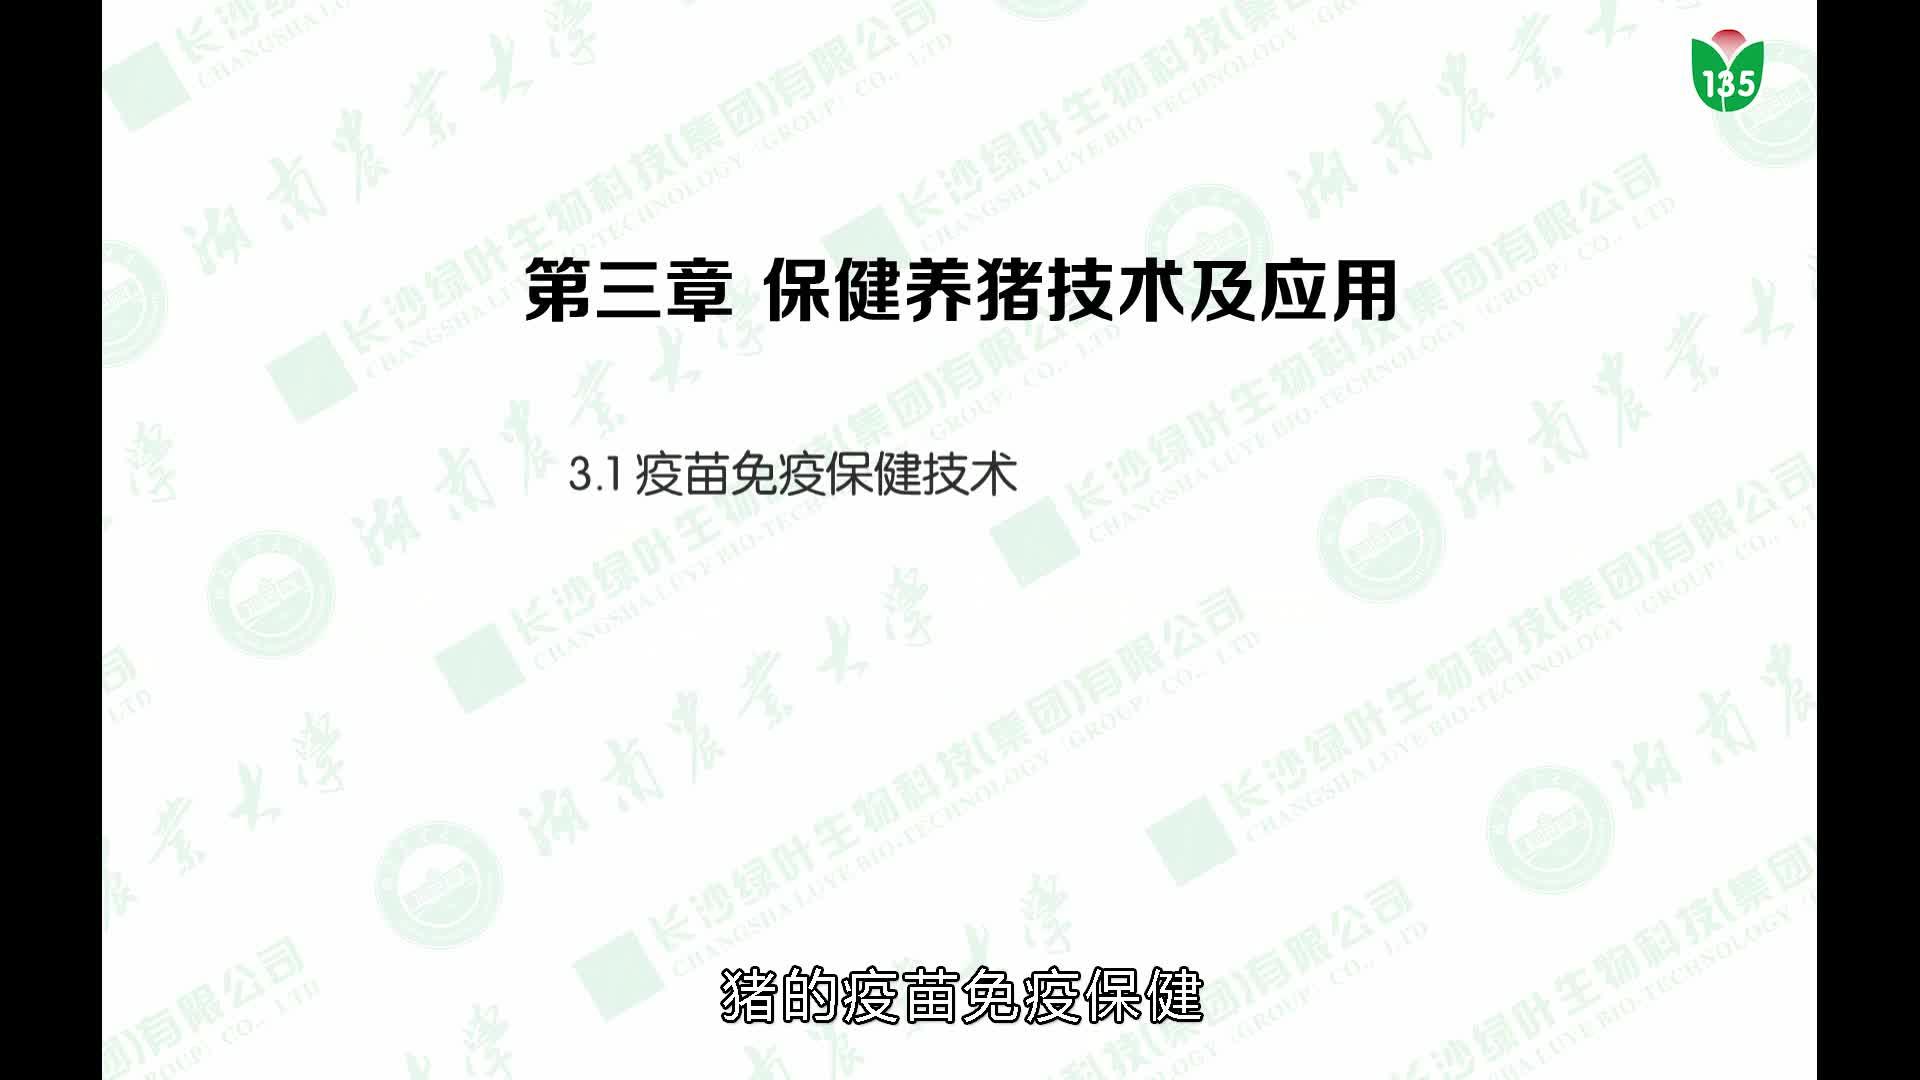 ��l:135高效保健�B�i技�g之疫苗免疫保健技�g(文利新教授)